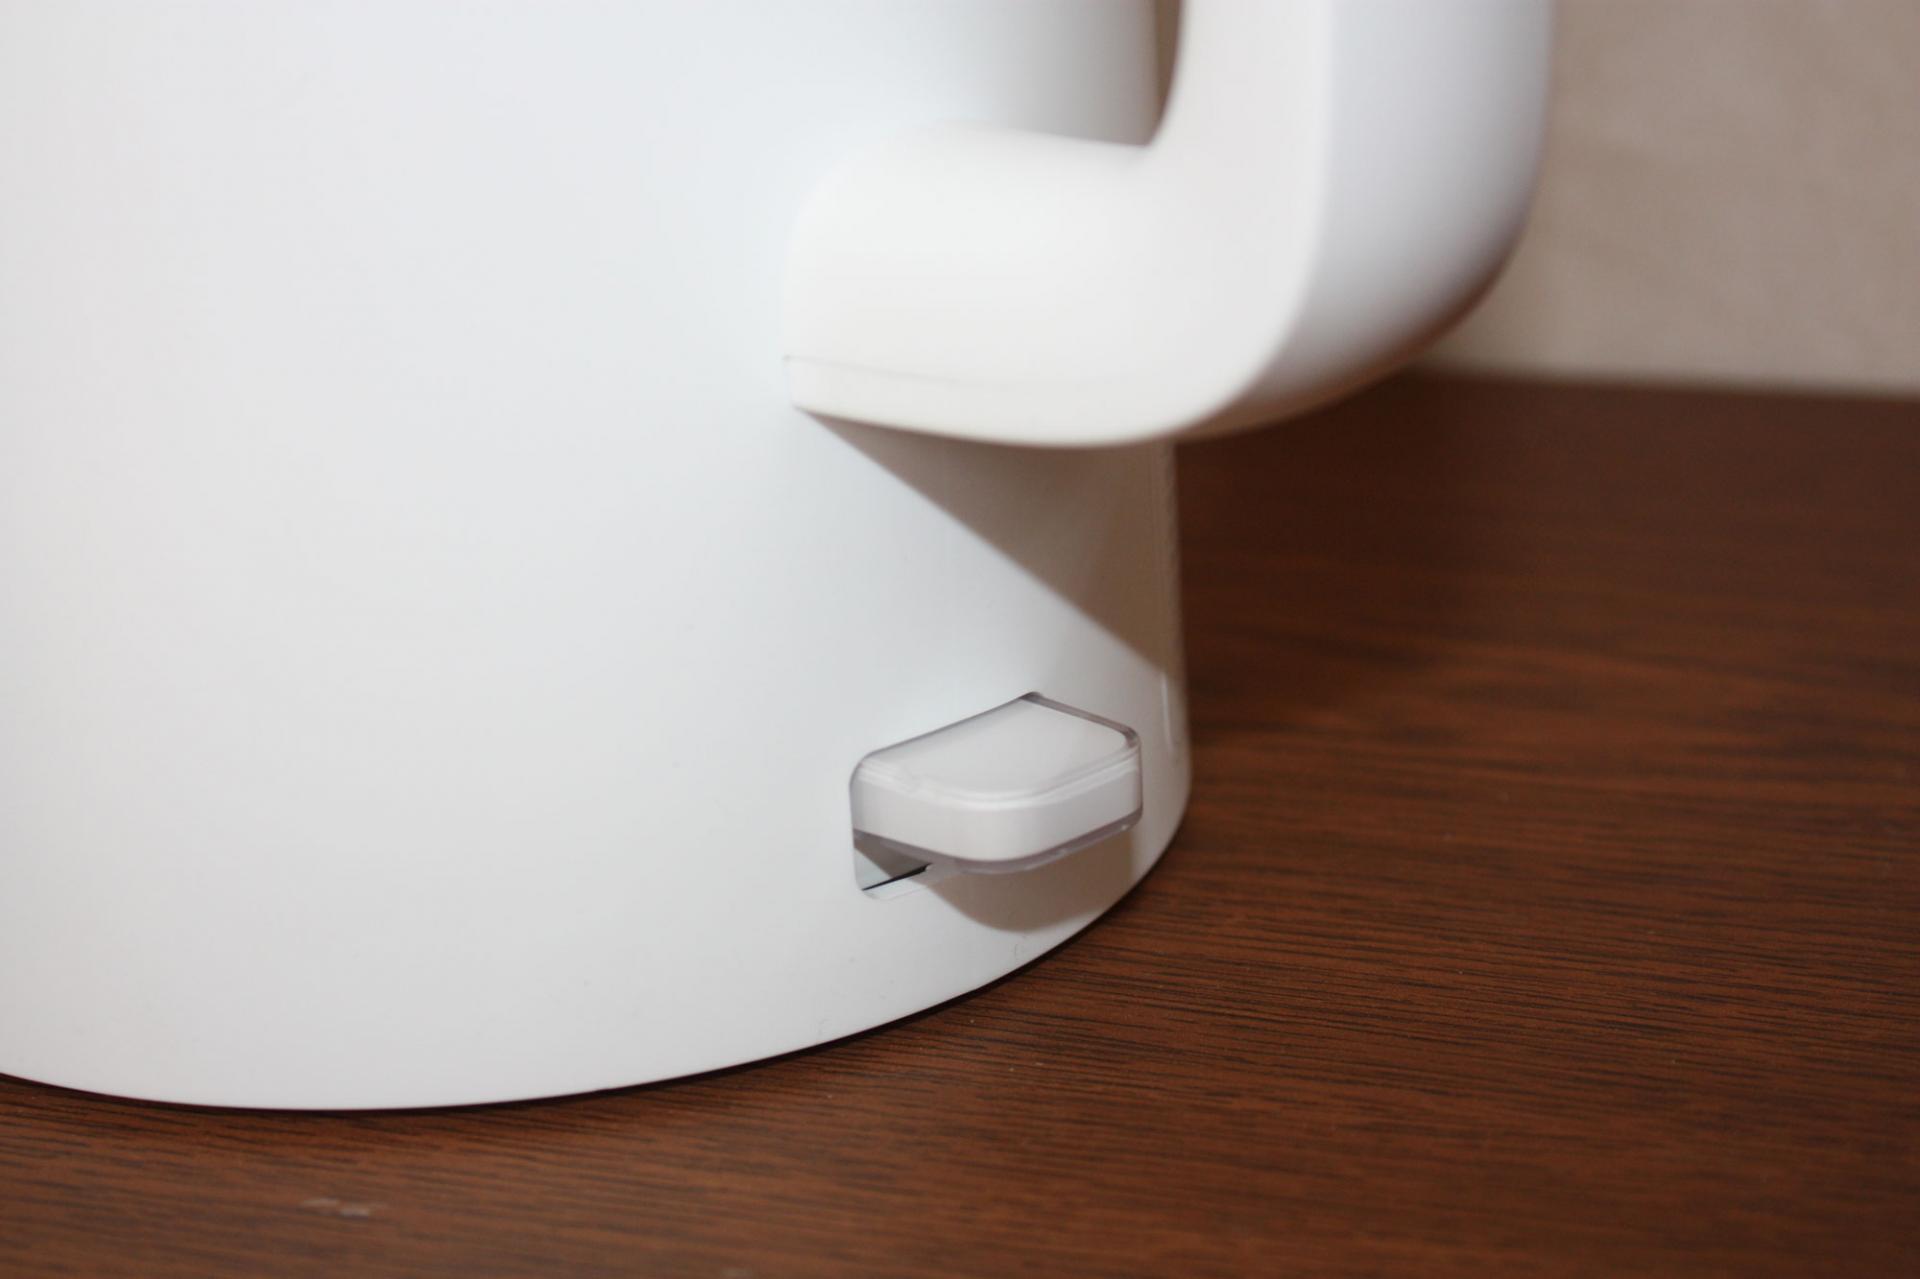 Обзор электрического чайника Xiaomi MiKettle